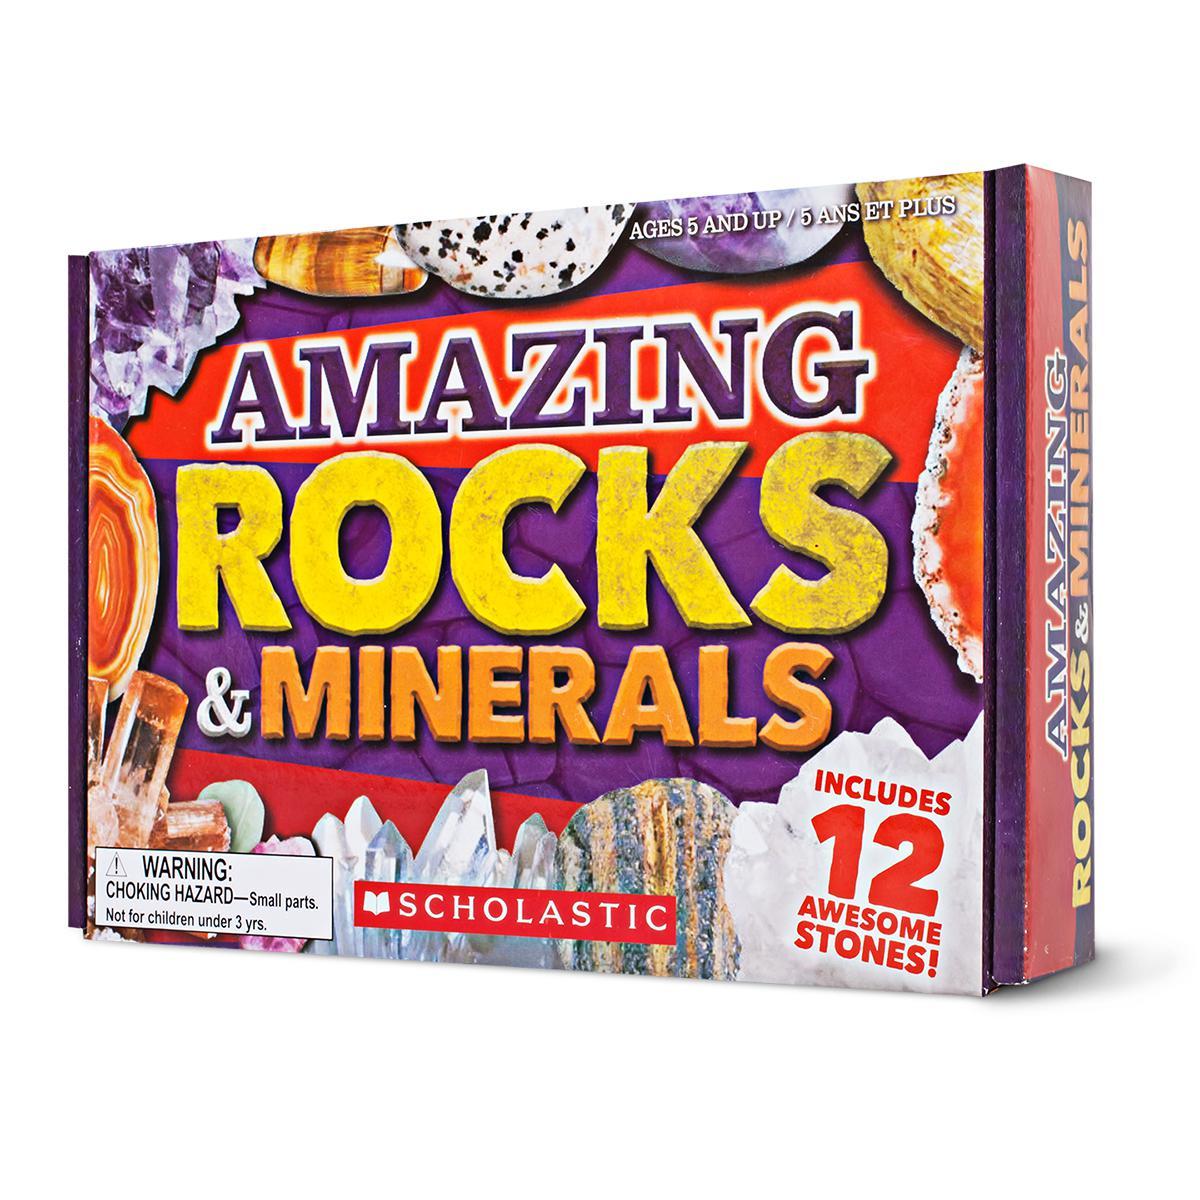 Amazing Rocks & Minerals